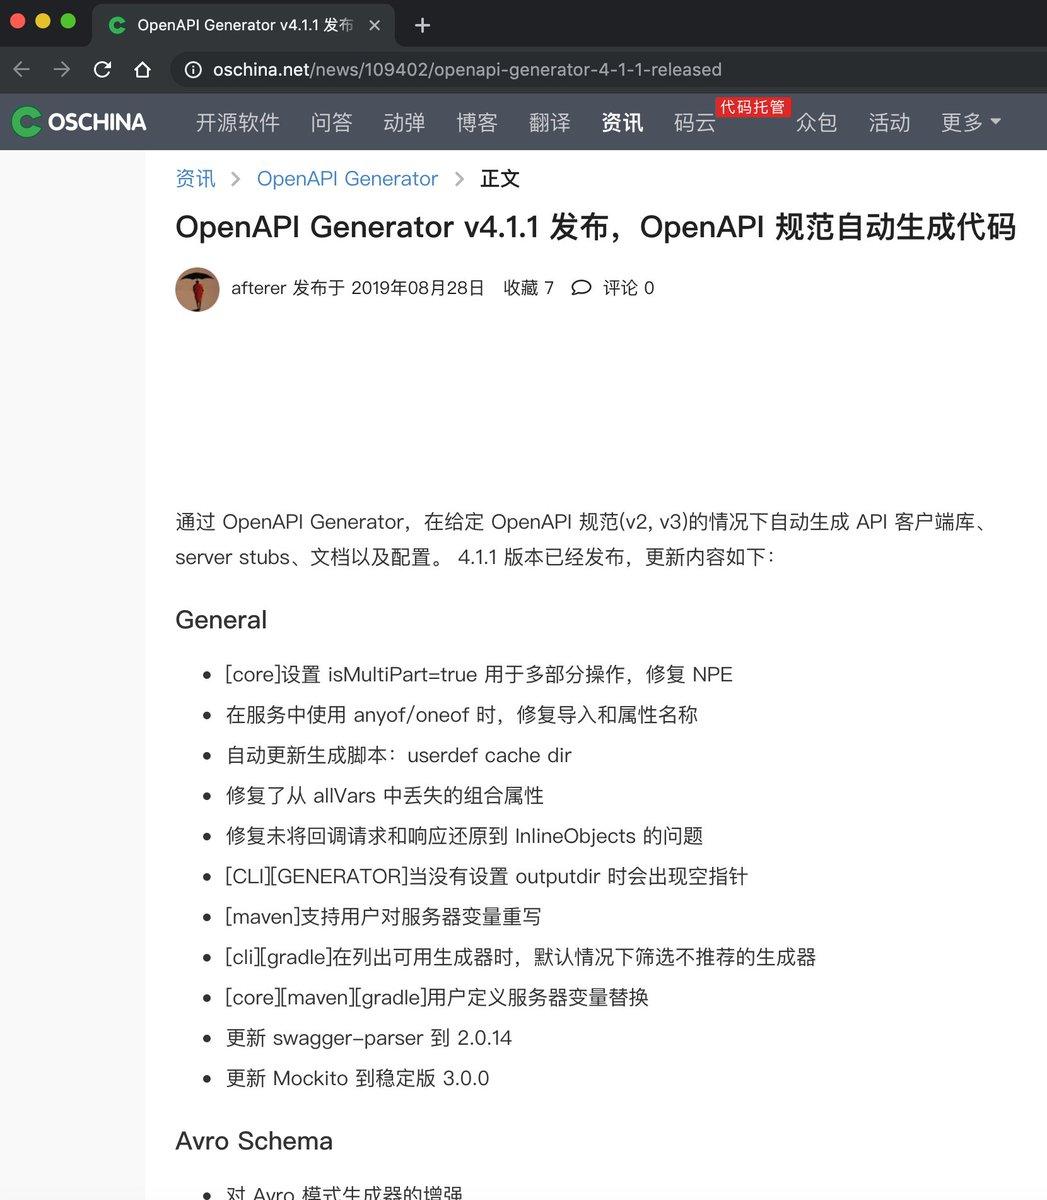 OpenAPI Generator (@oas_generator) | Twitter